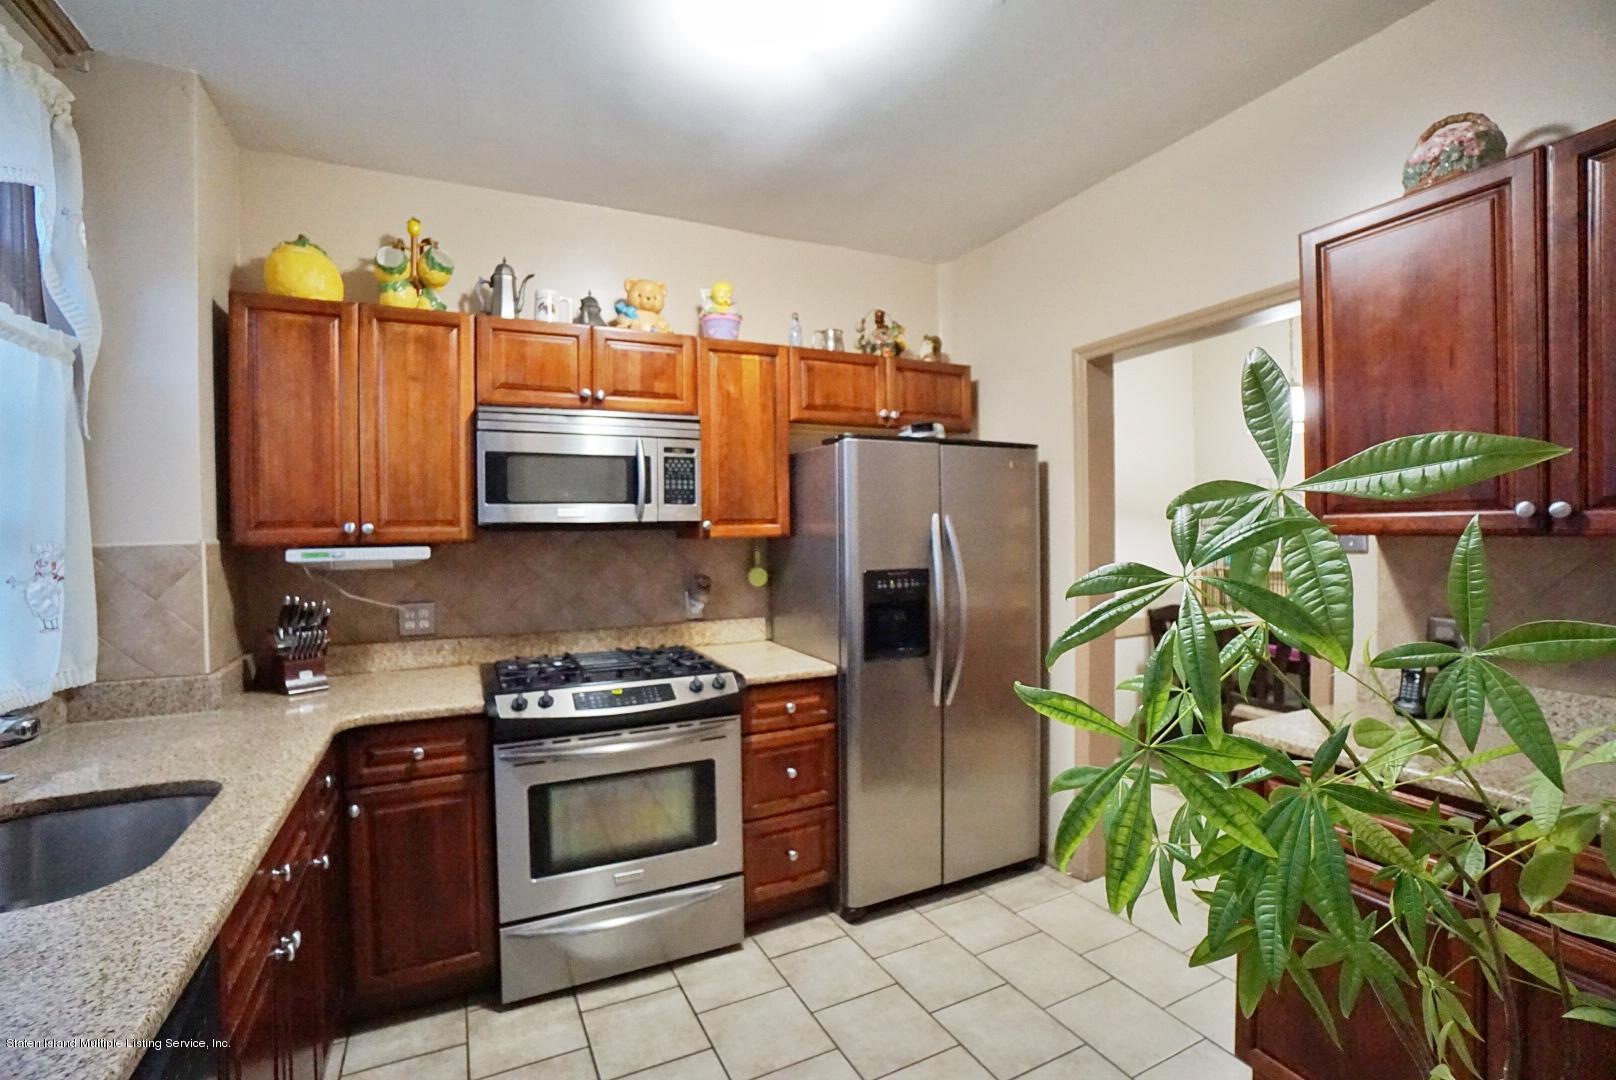 Single Family - Detached 31 Pelton Avenue  Staten Island, NY 10310, MLS-1132177-12